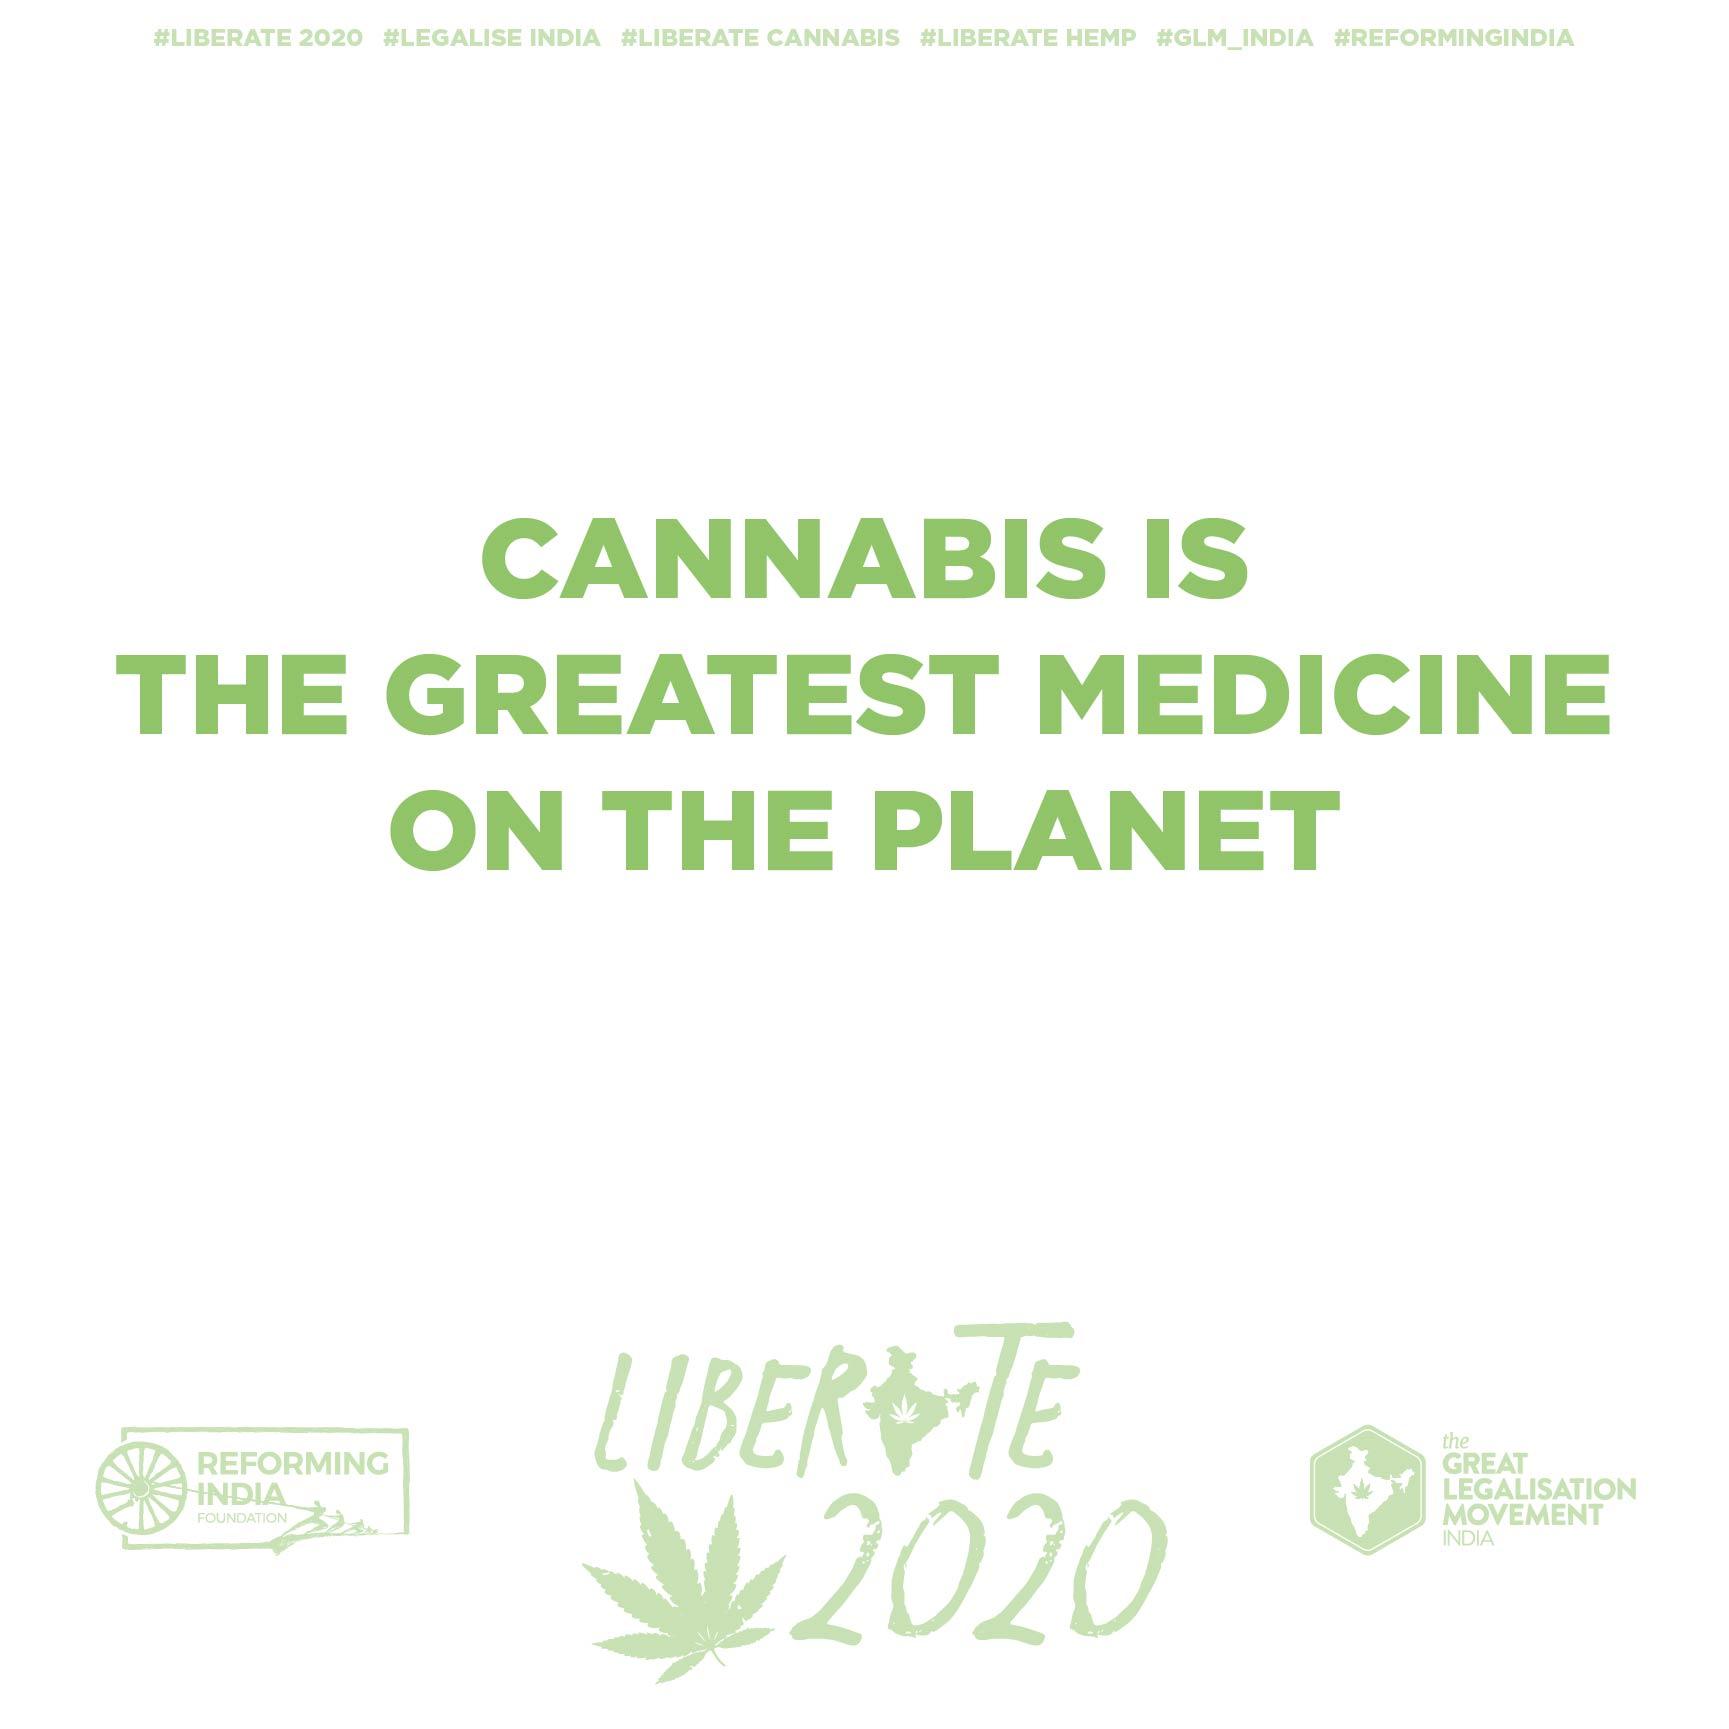 cannabisArtboard 1 copy 5-50.jpg